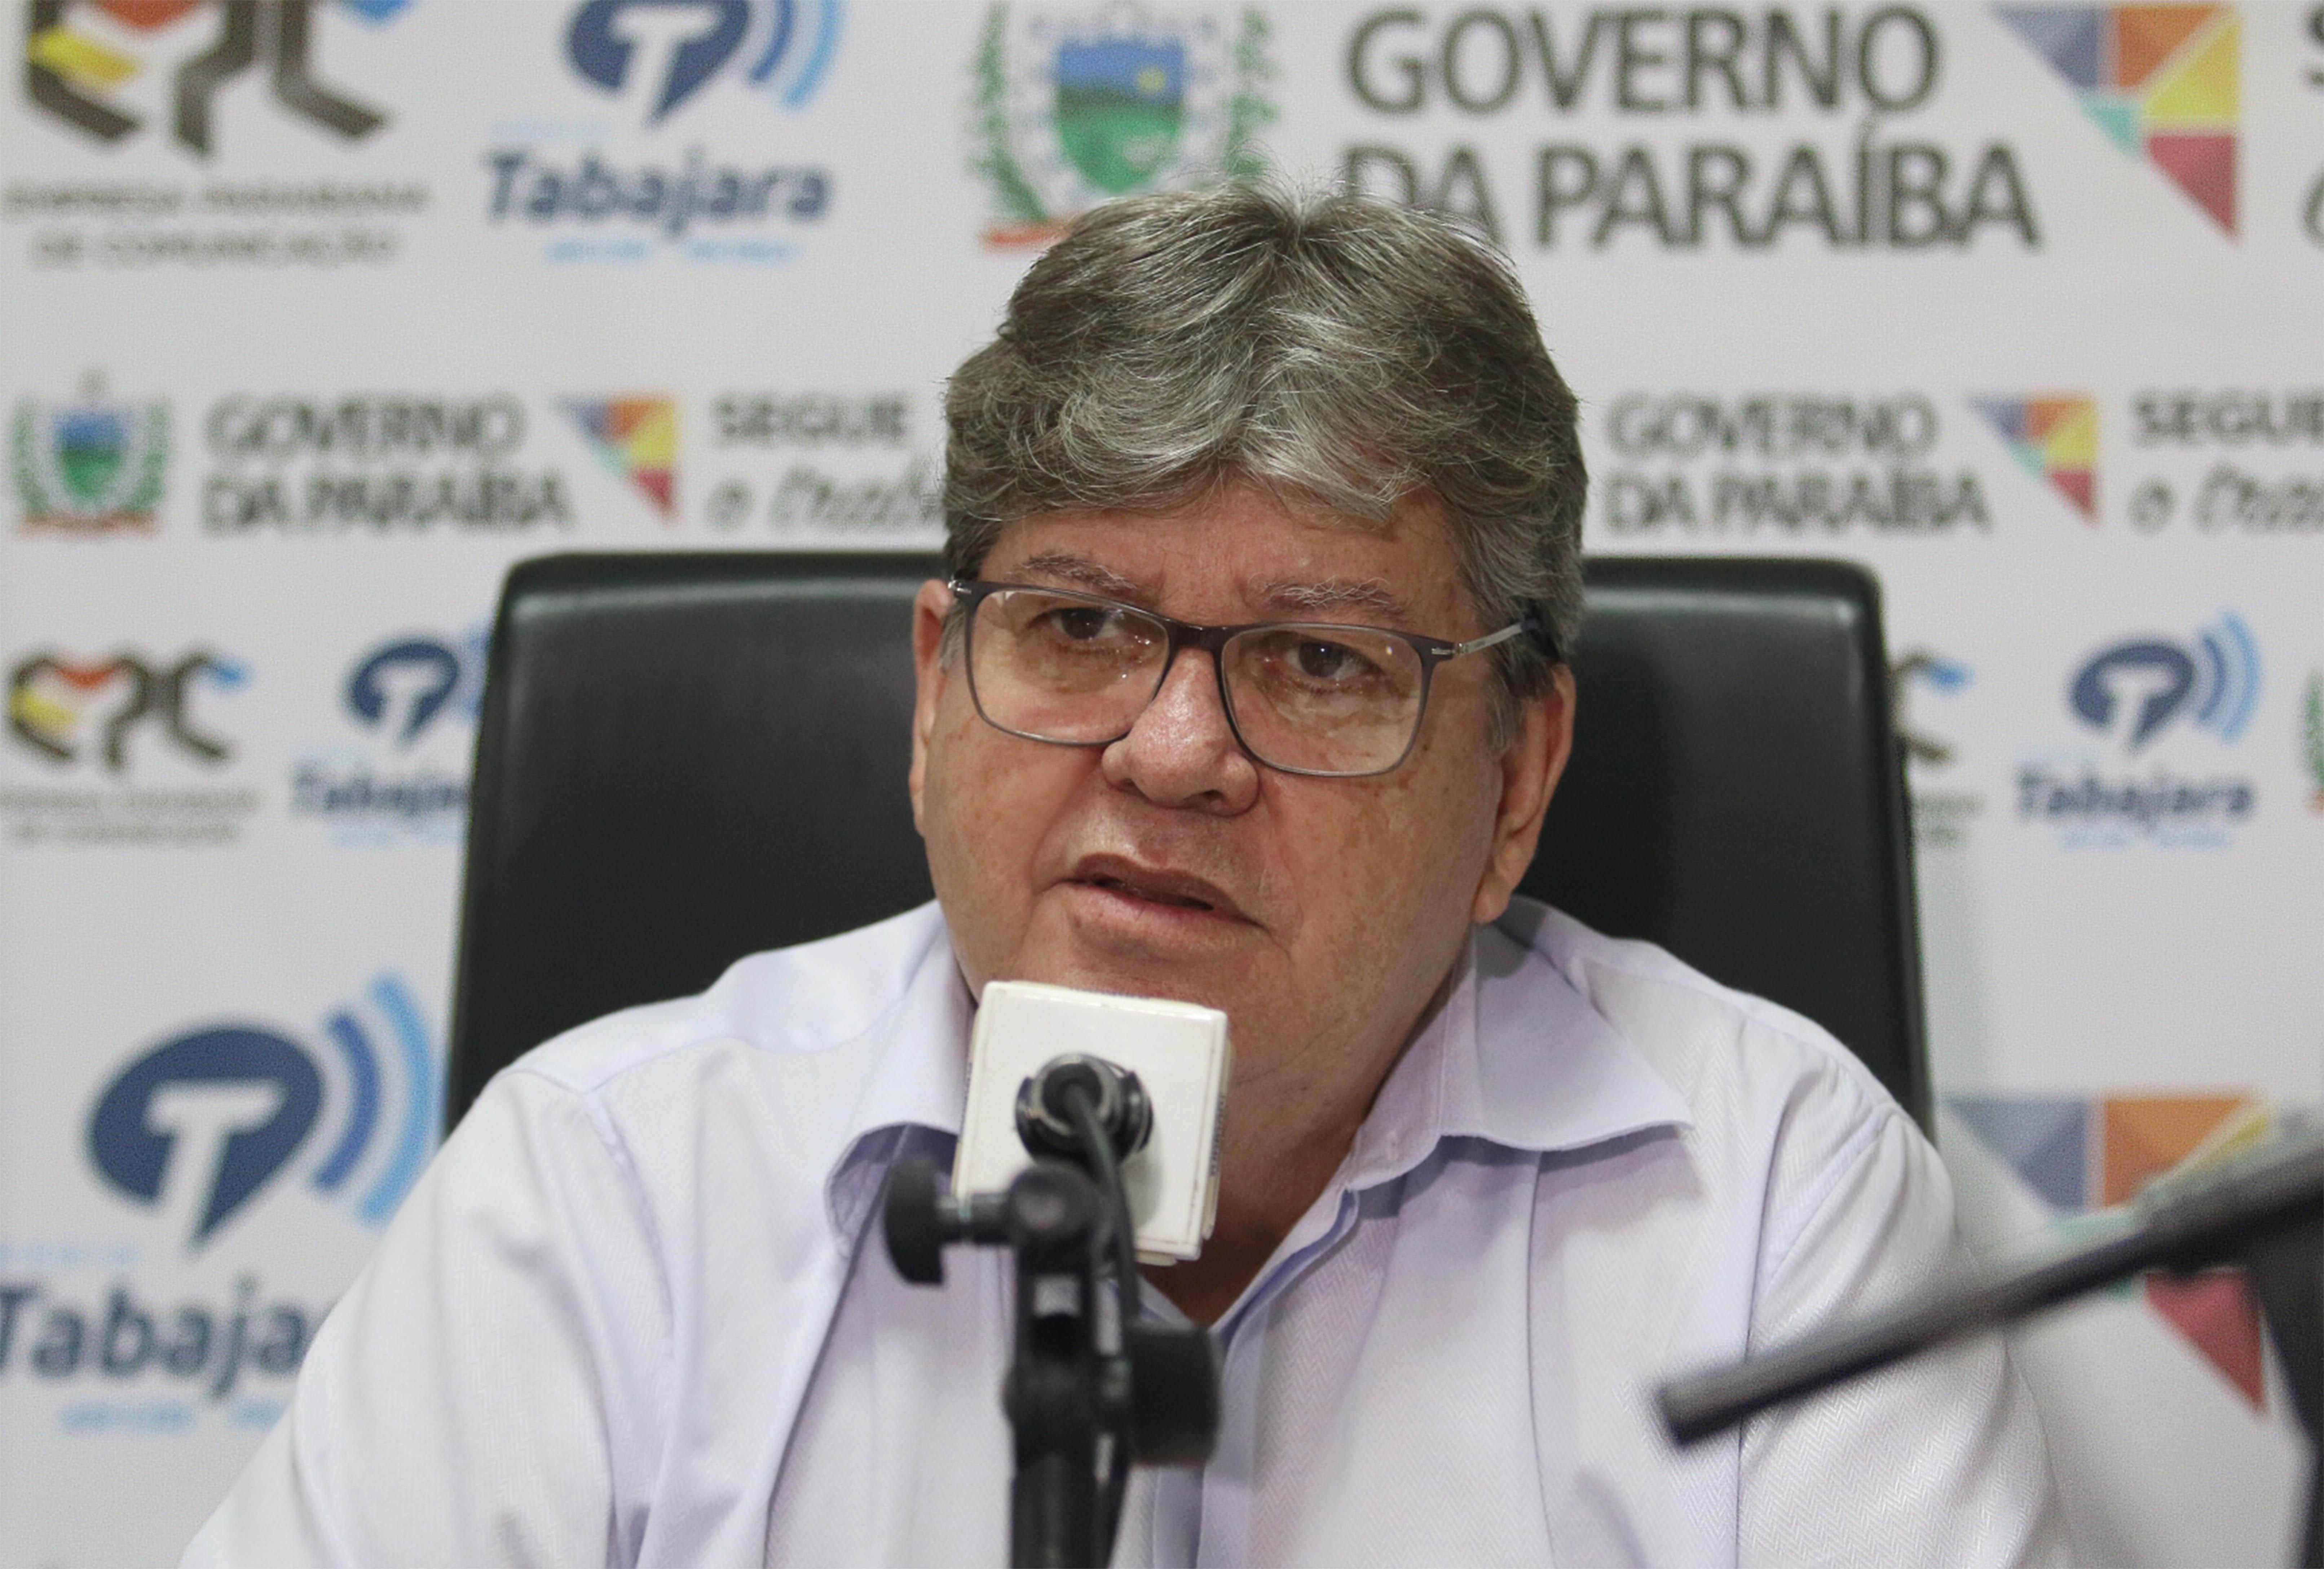 joao azevedo no programa fala governador_foto francisco franca (1)